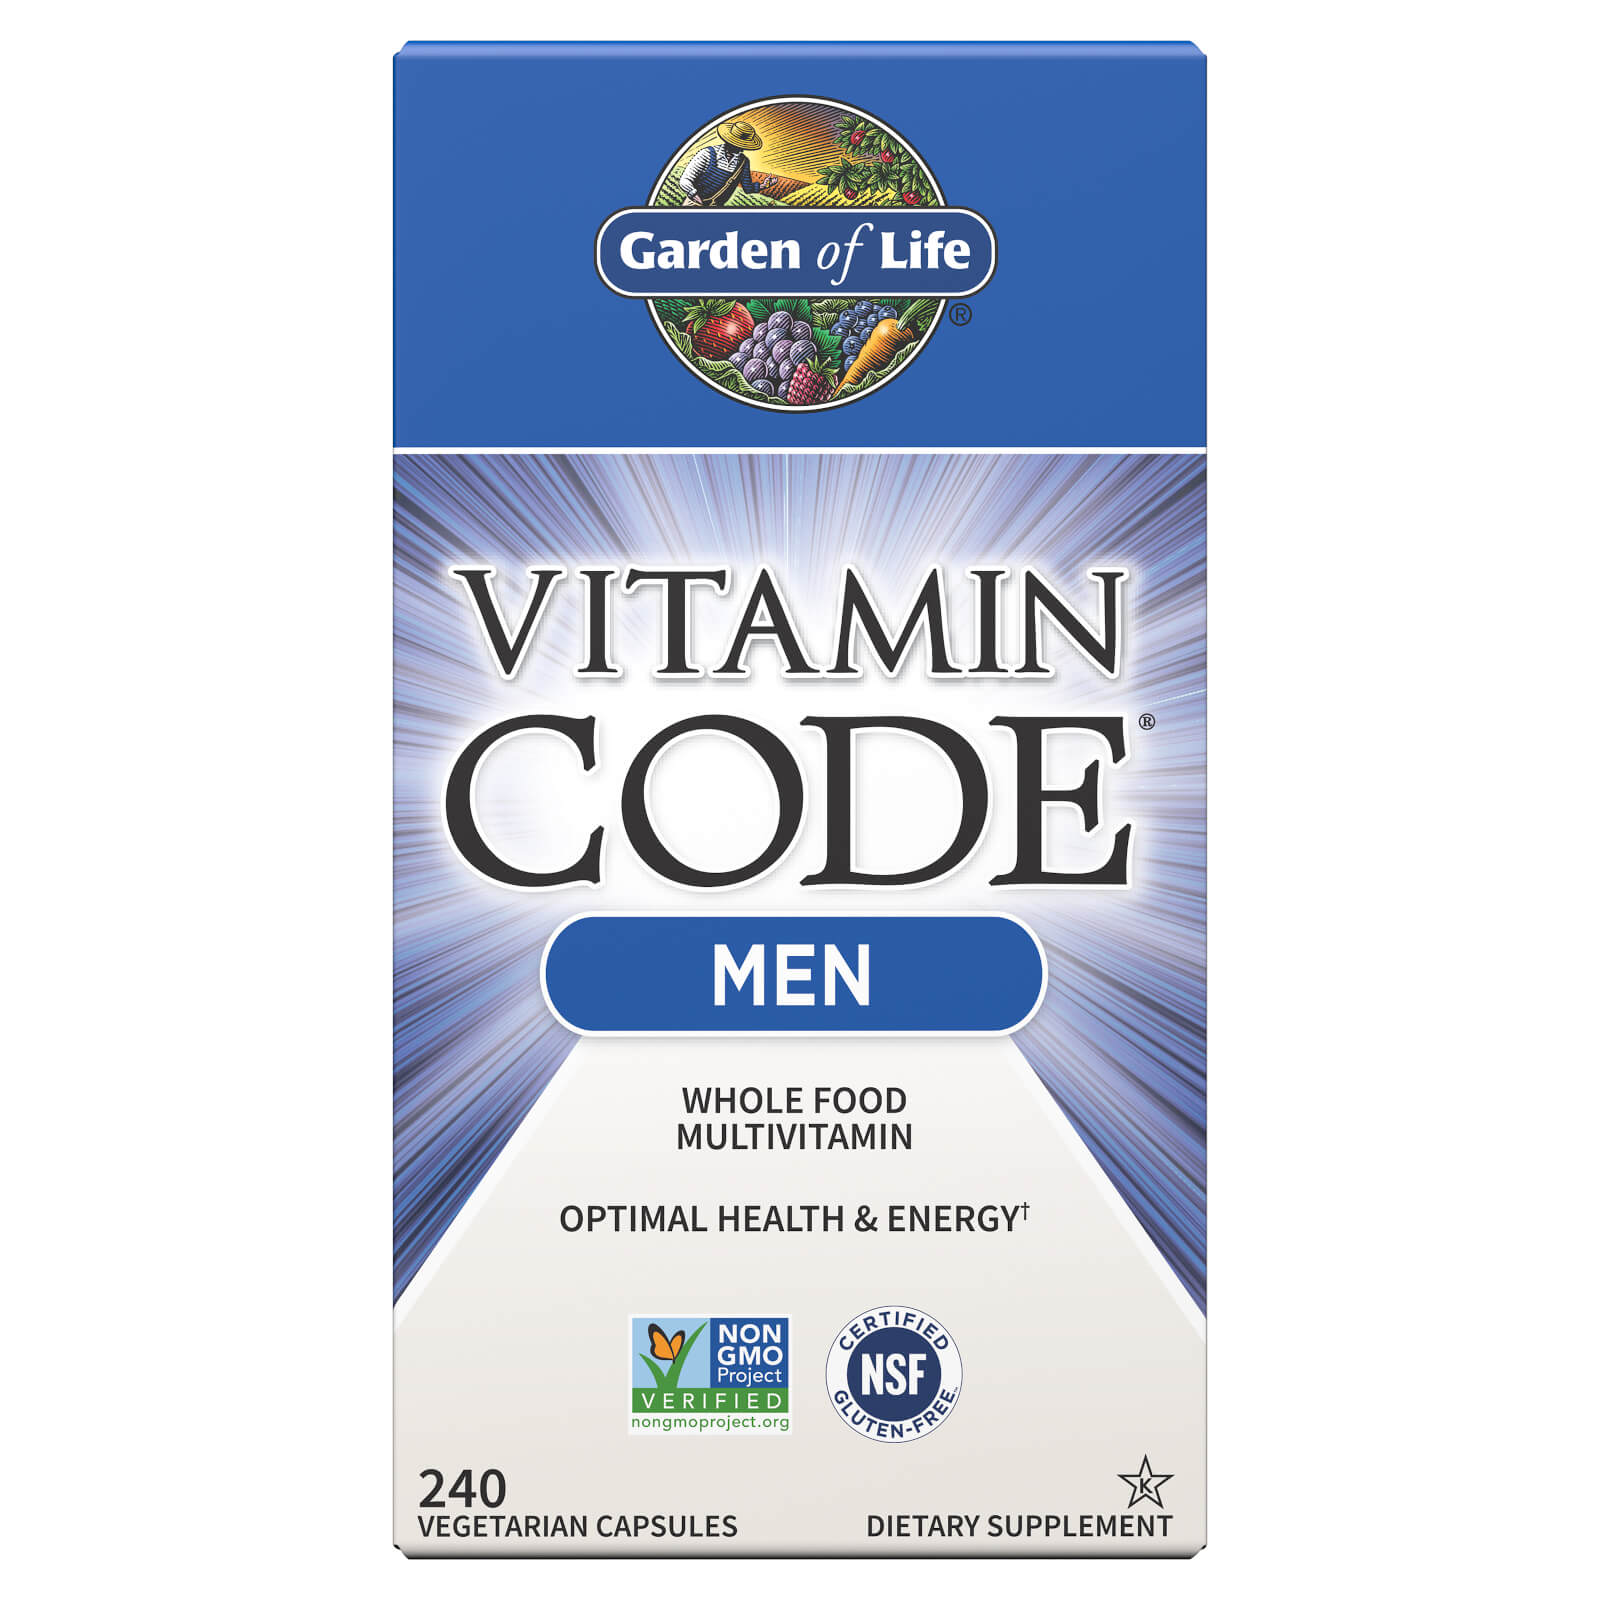 Garden of Life Vitamin Code Men - 240 Capsules